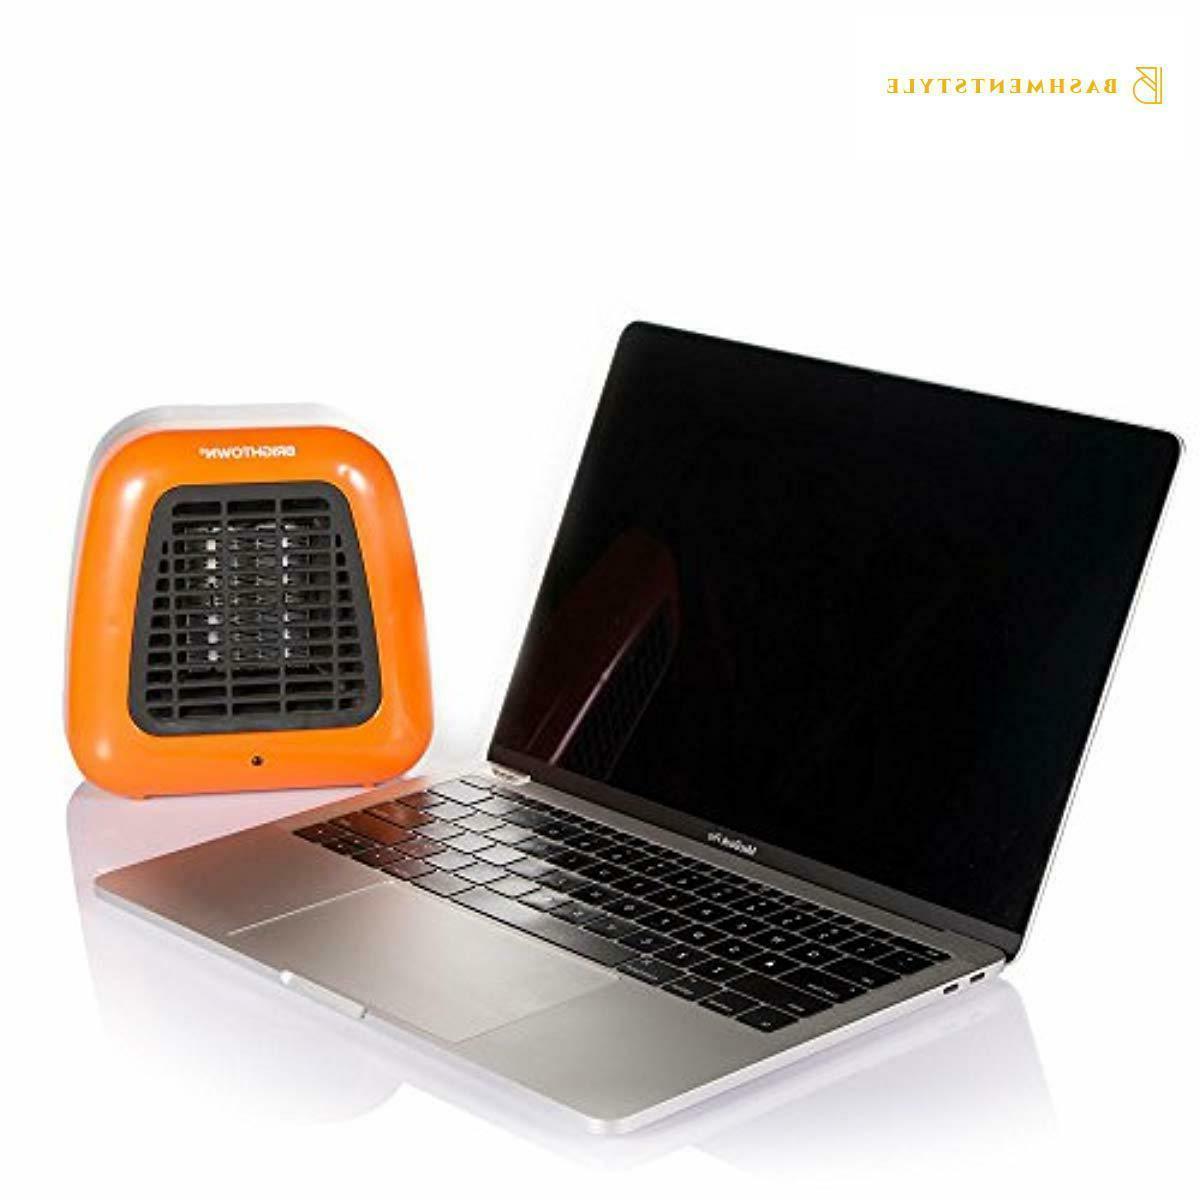 400-Watt Portable-Mini Heater Office Desktop T